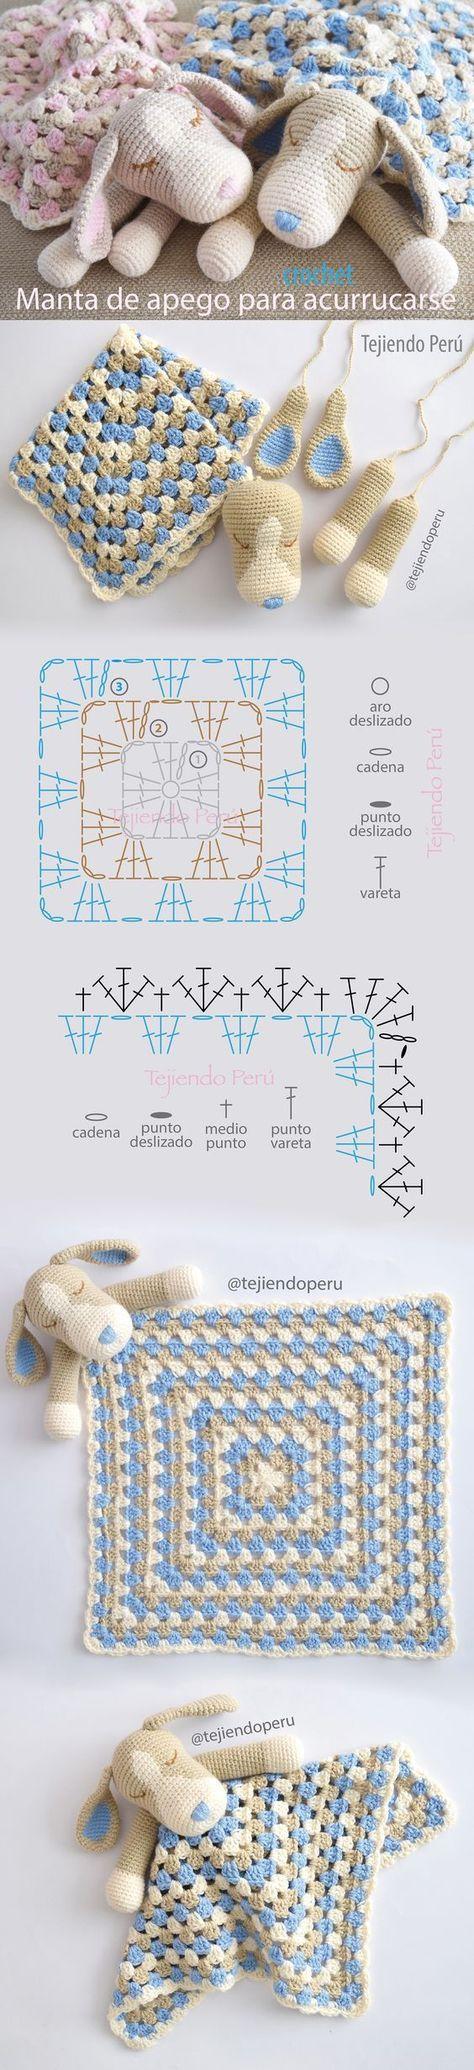 111 best погремушки images on Pinterest   Crochet animals, Crocheted ...